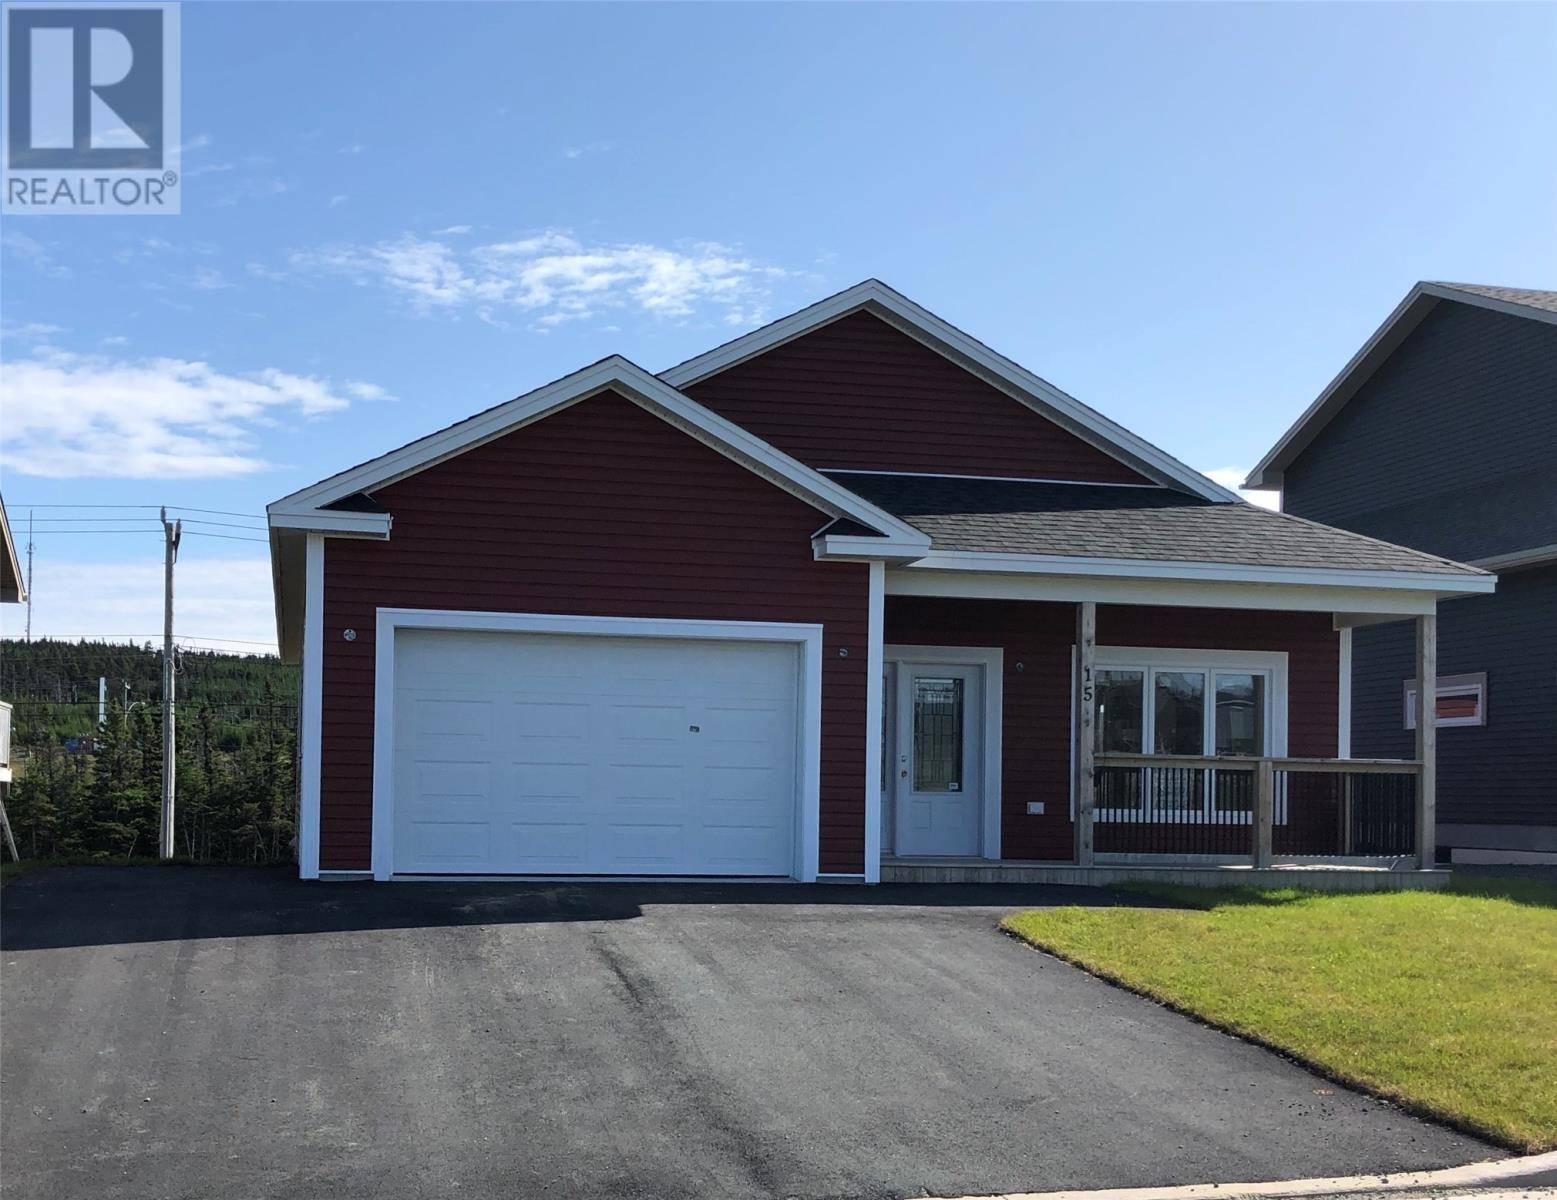 House for sale at 15 Leonard J. Cowley St St. John's Newfoundland - MLS: 1202752